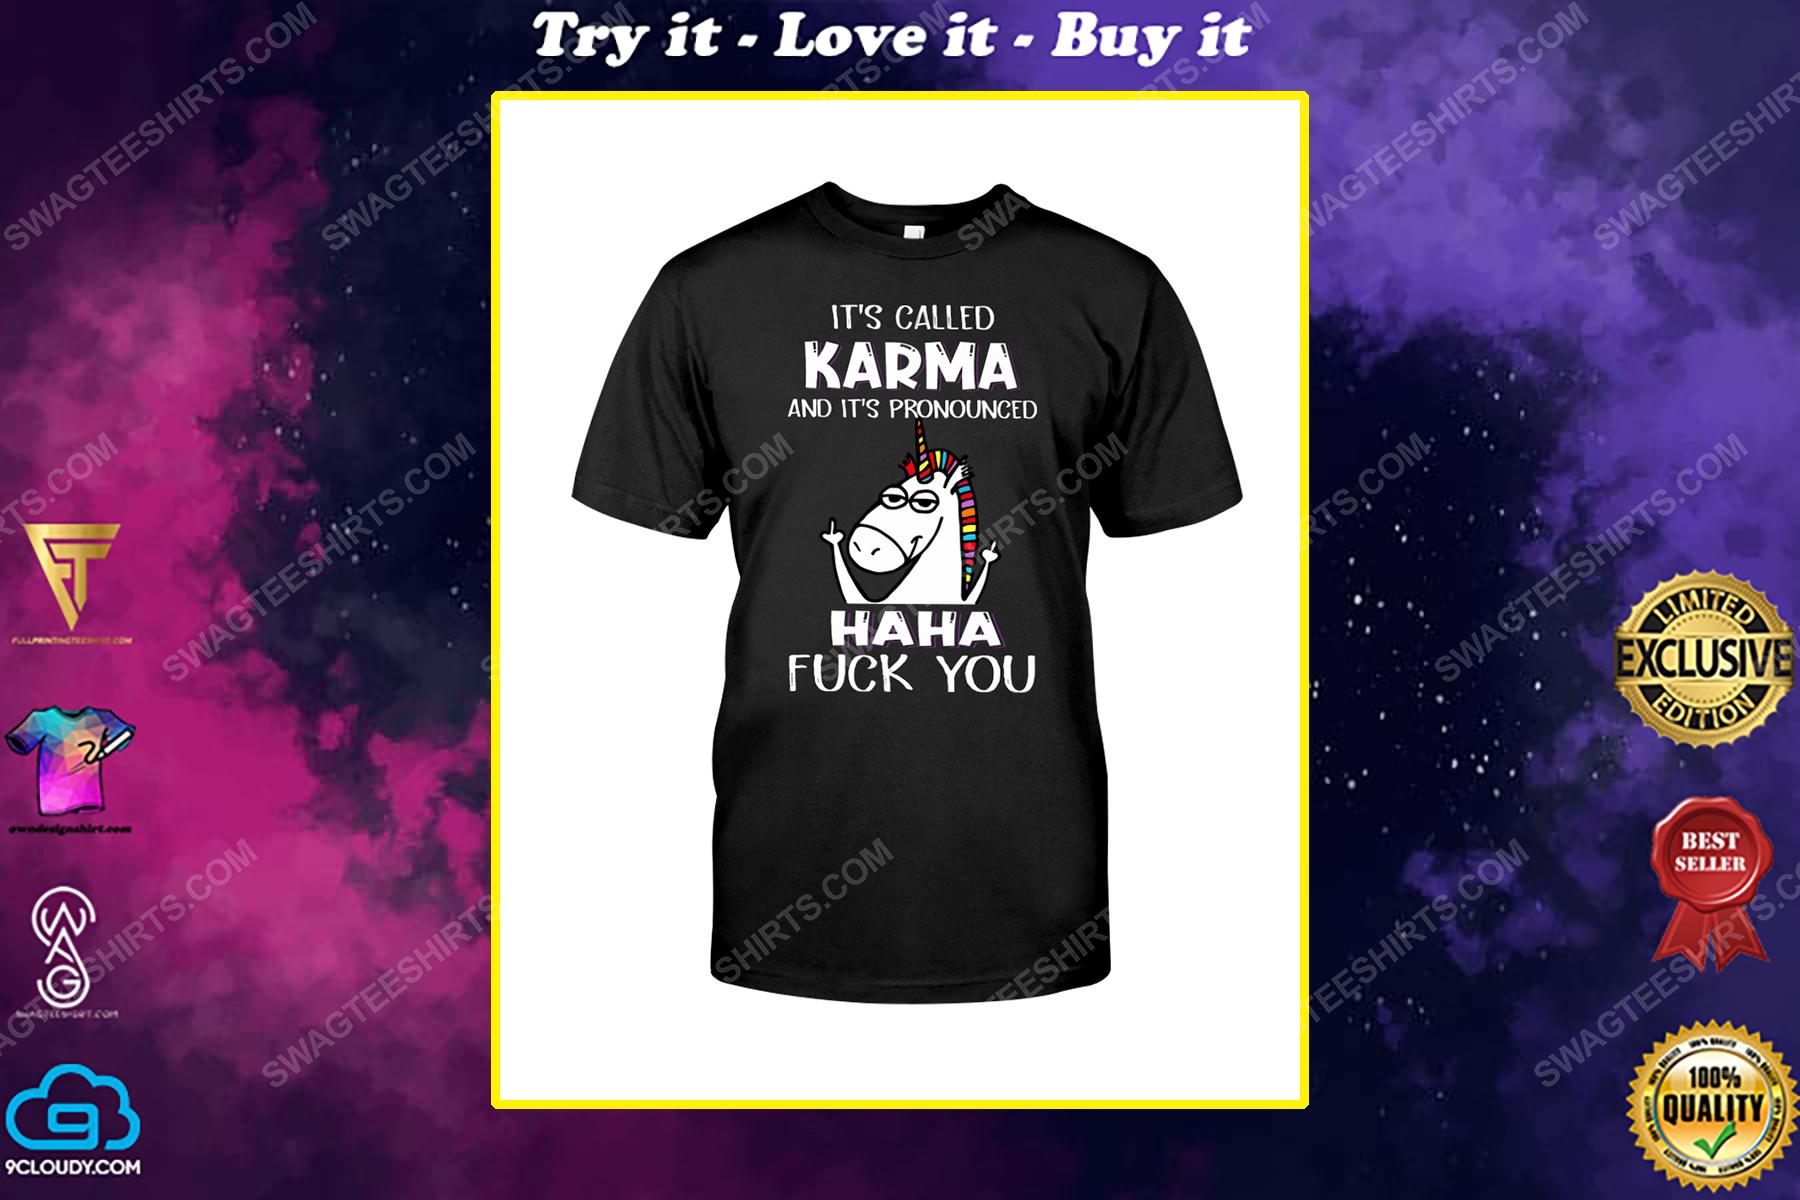 Unicorn it's called karma and it's pronounced haha fuck you shirt